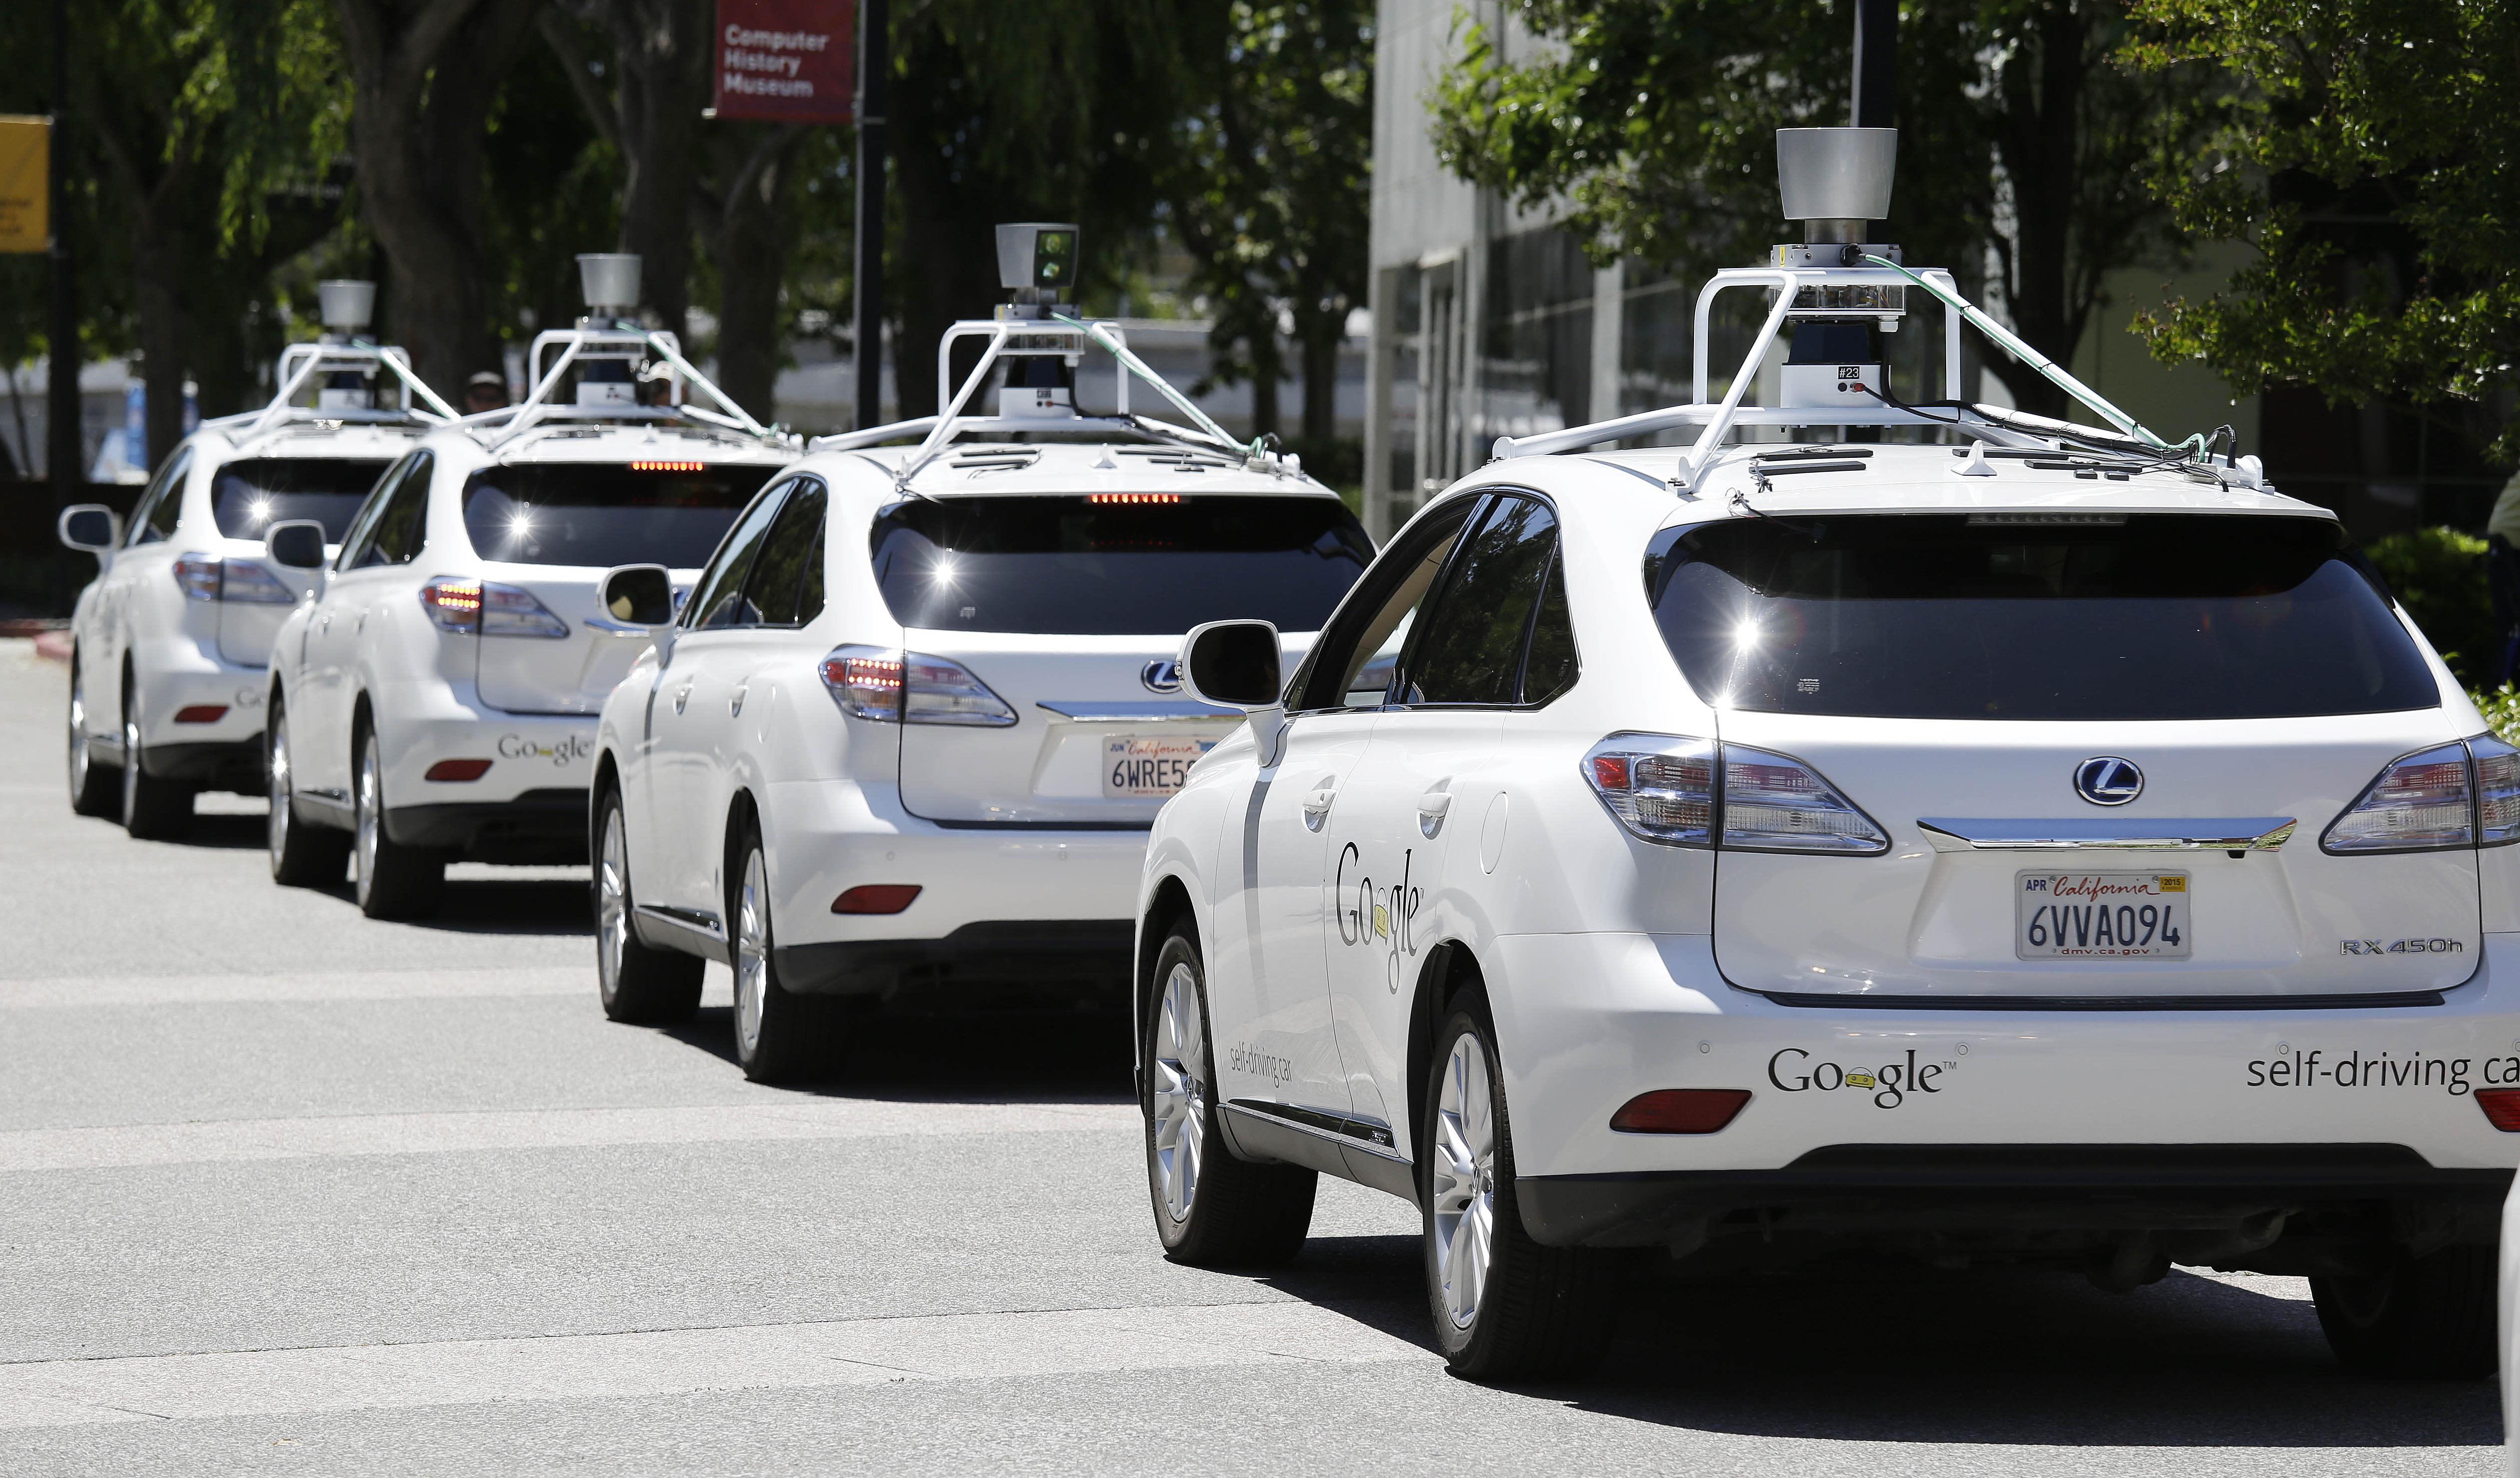 Warren Buffett on driverless cars and auto insurance